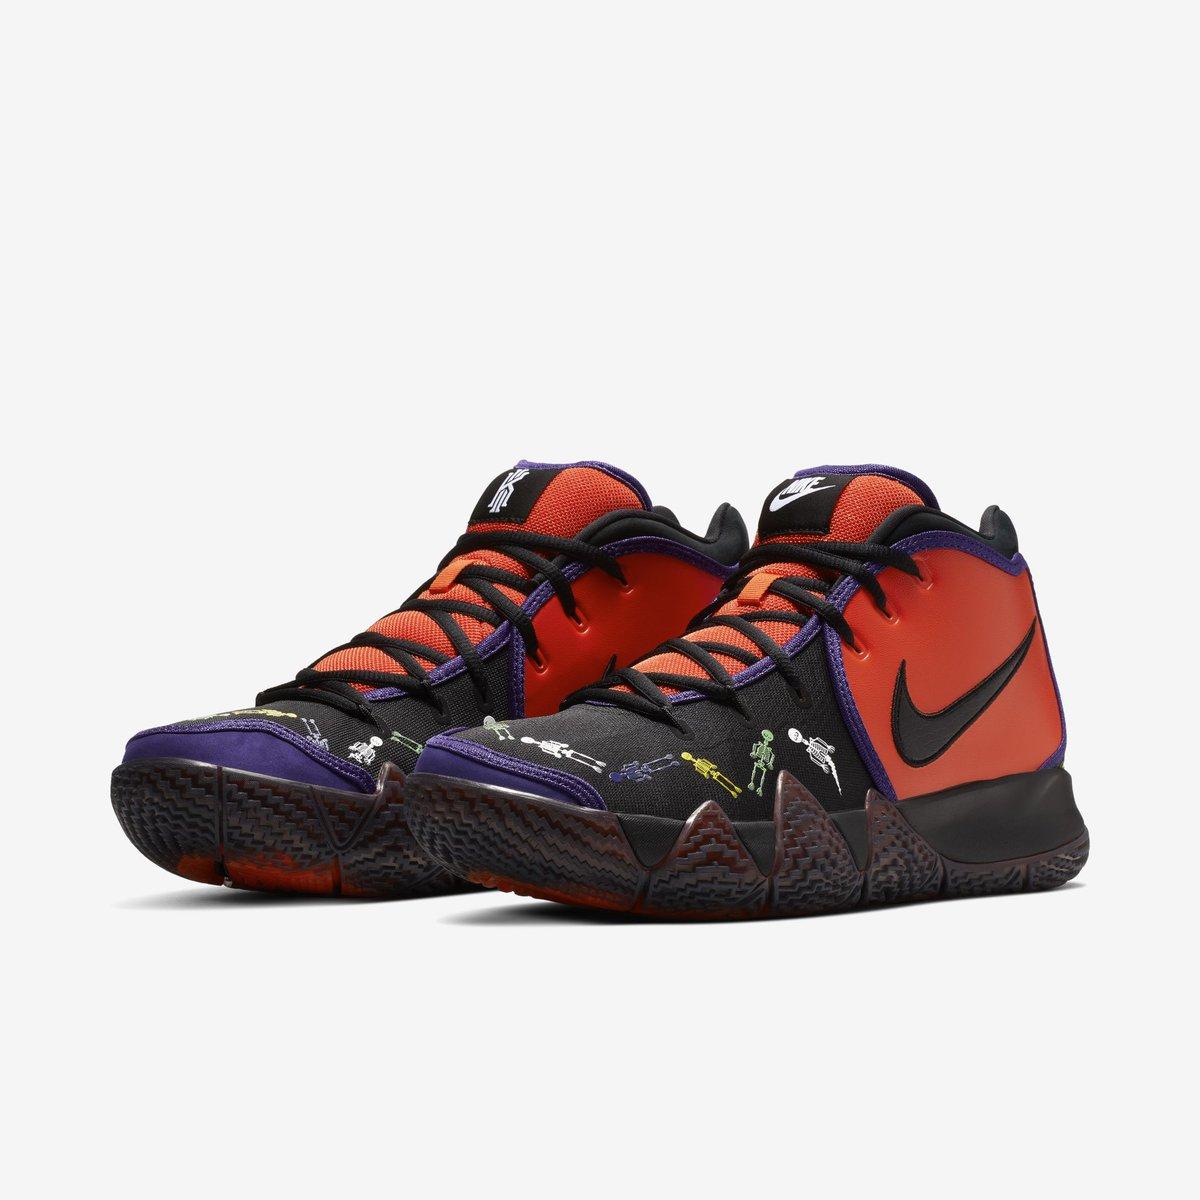 6a3abc3c0e5 Kicks   Les Nike Kyrie 4 « Day of the Dead »